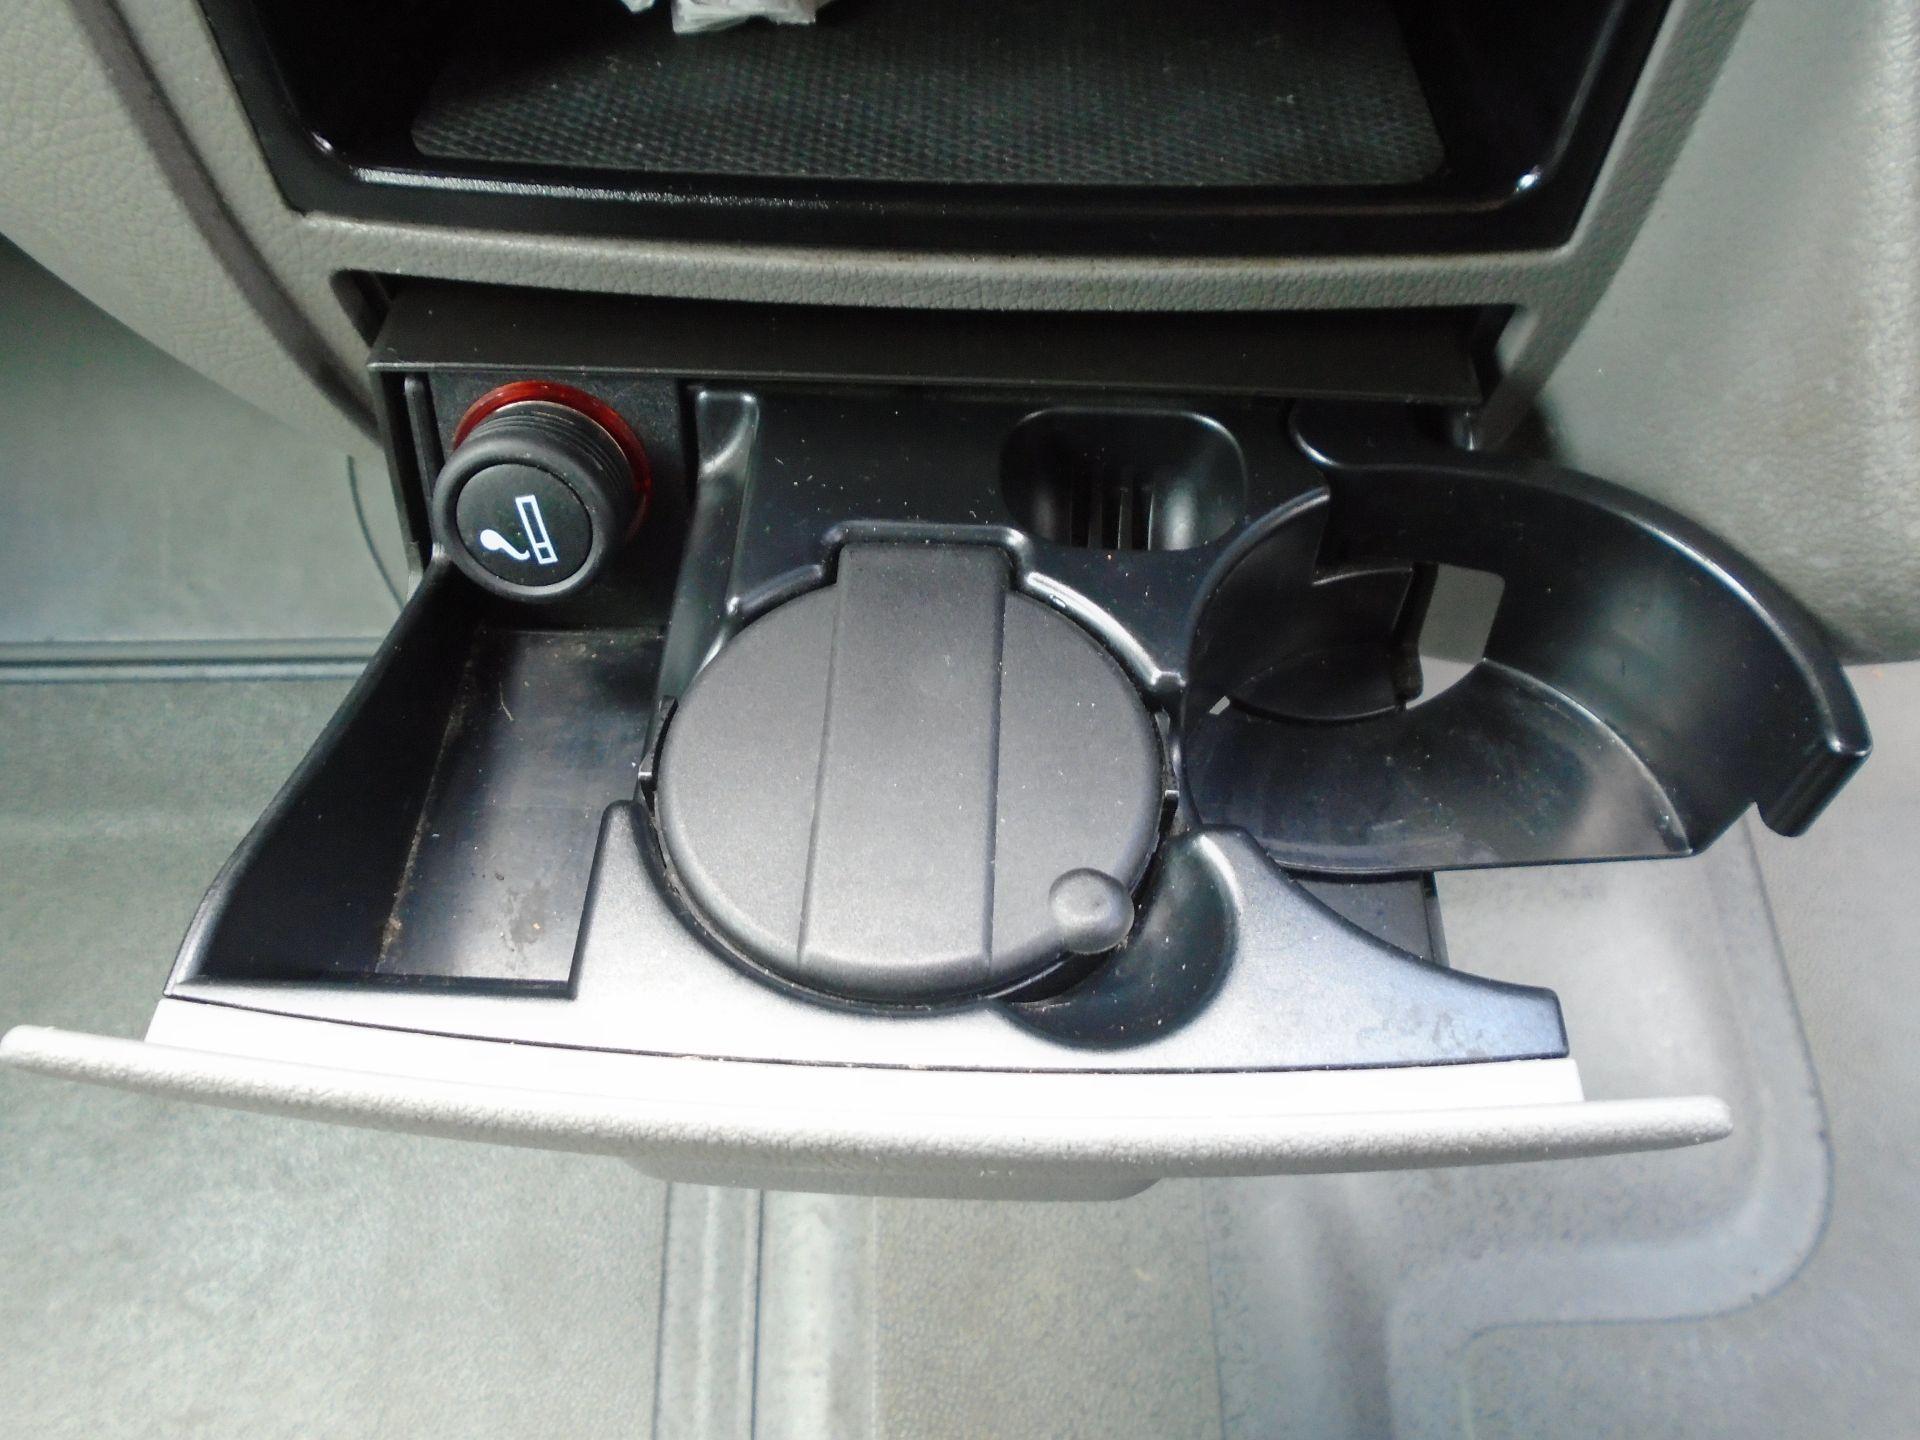 2015 Volkswagen Crafter CR35 LWB 2.0 TDI 136PS H/R EURO 5 (GF65LYX) Image 23